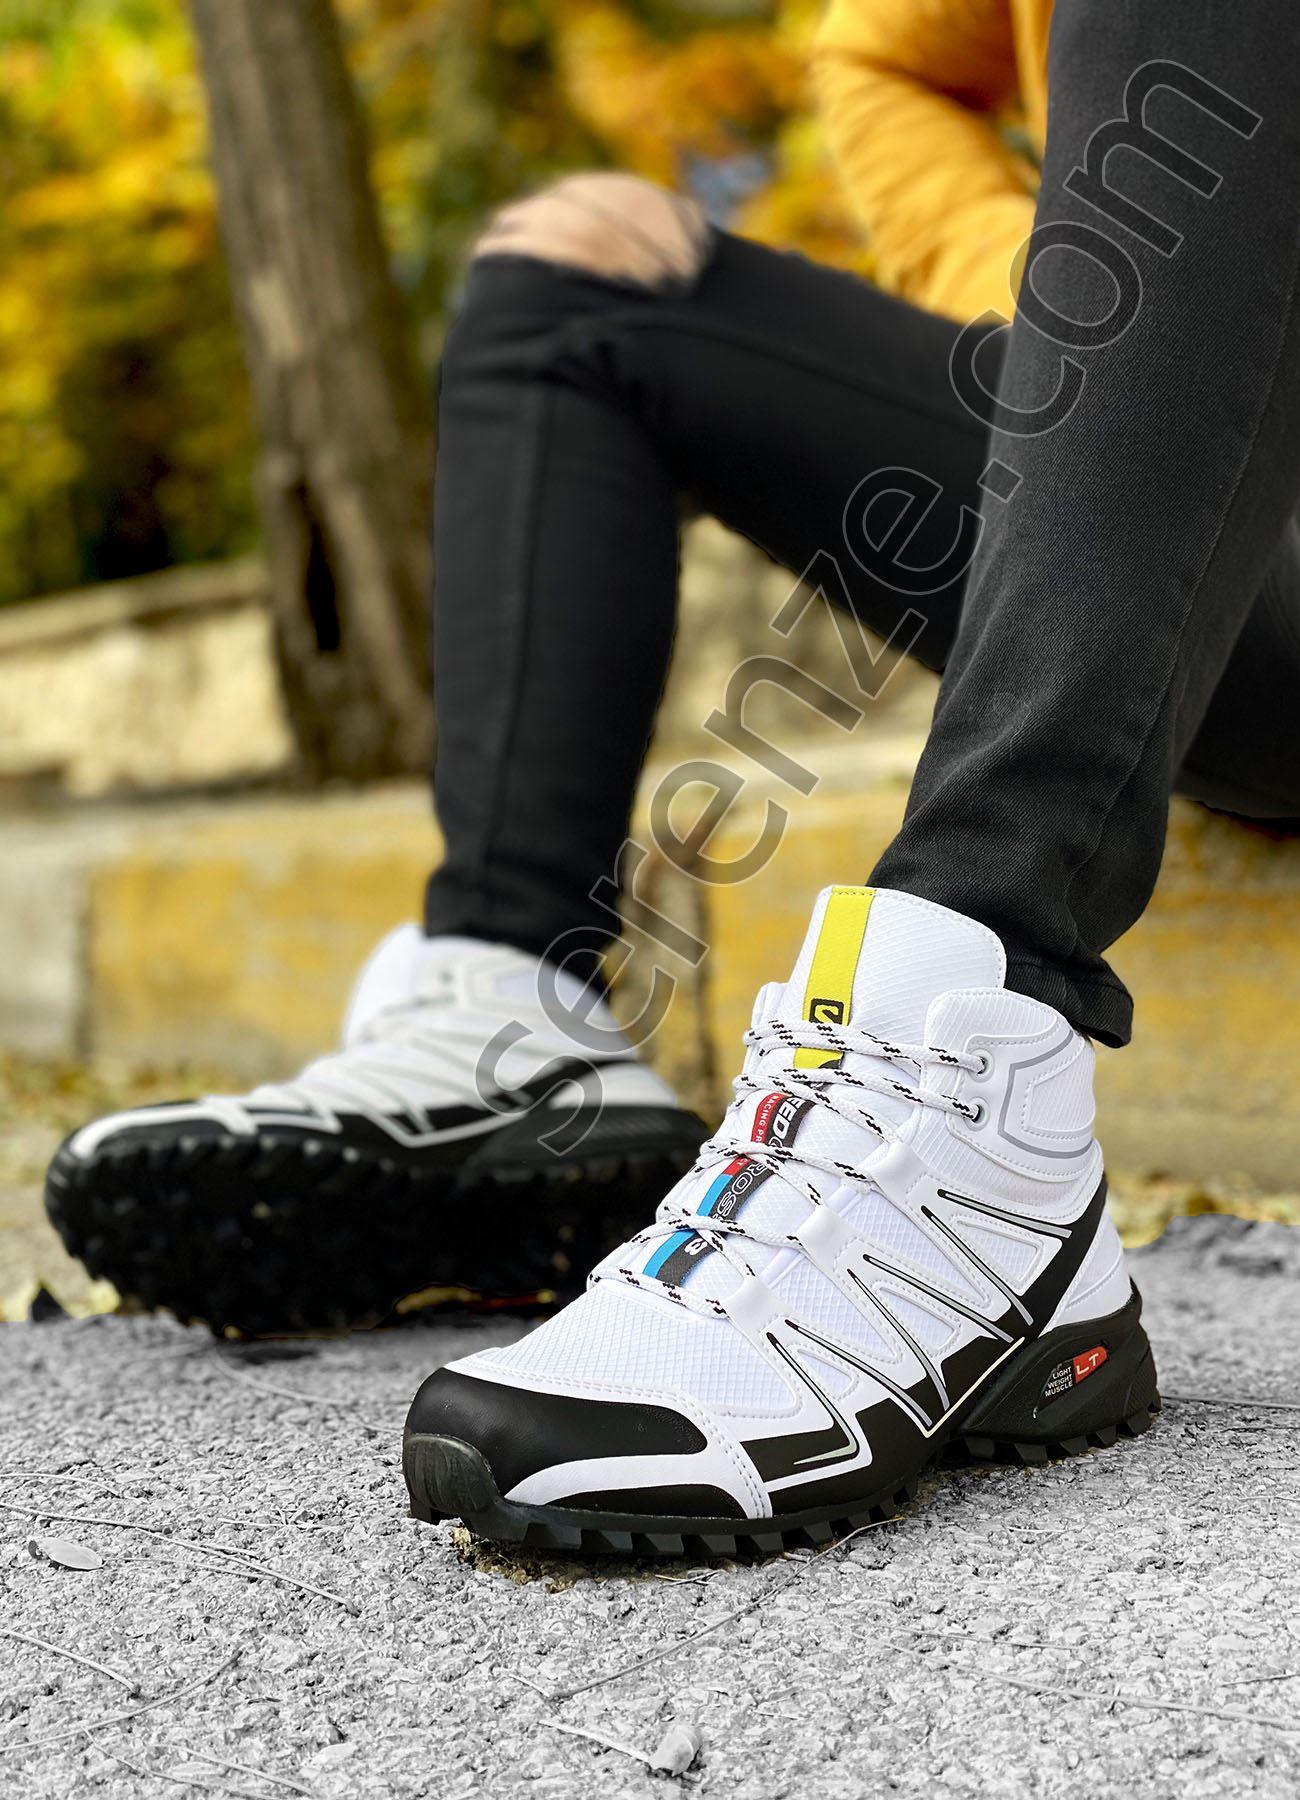 Beyaz Outdoor Trekking Erkek Bot